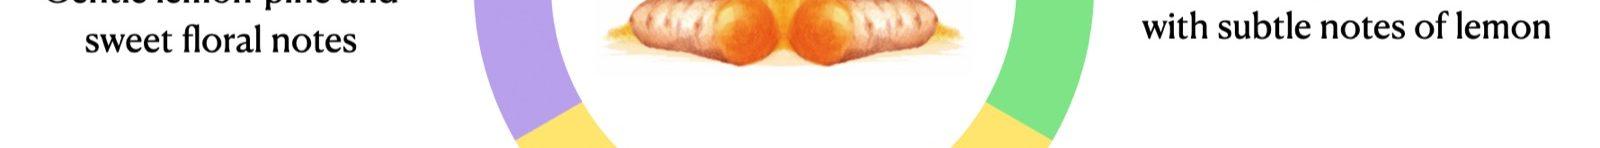 Cúrcuma, especia amarilla